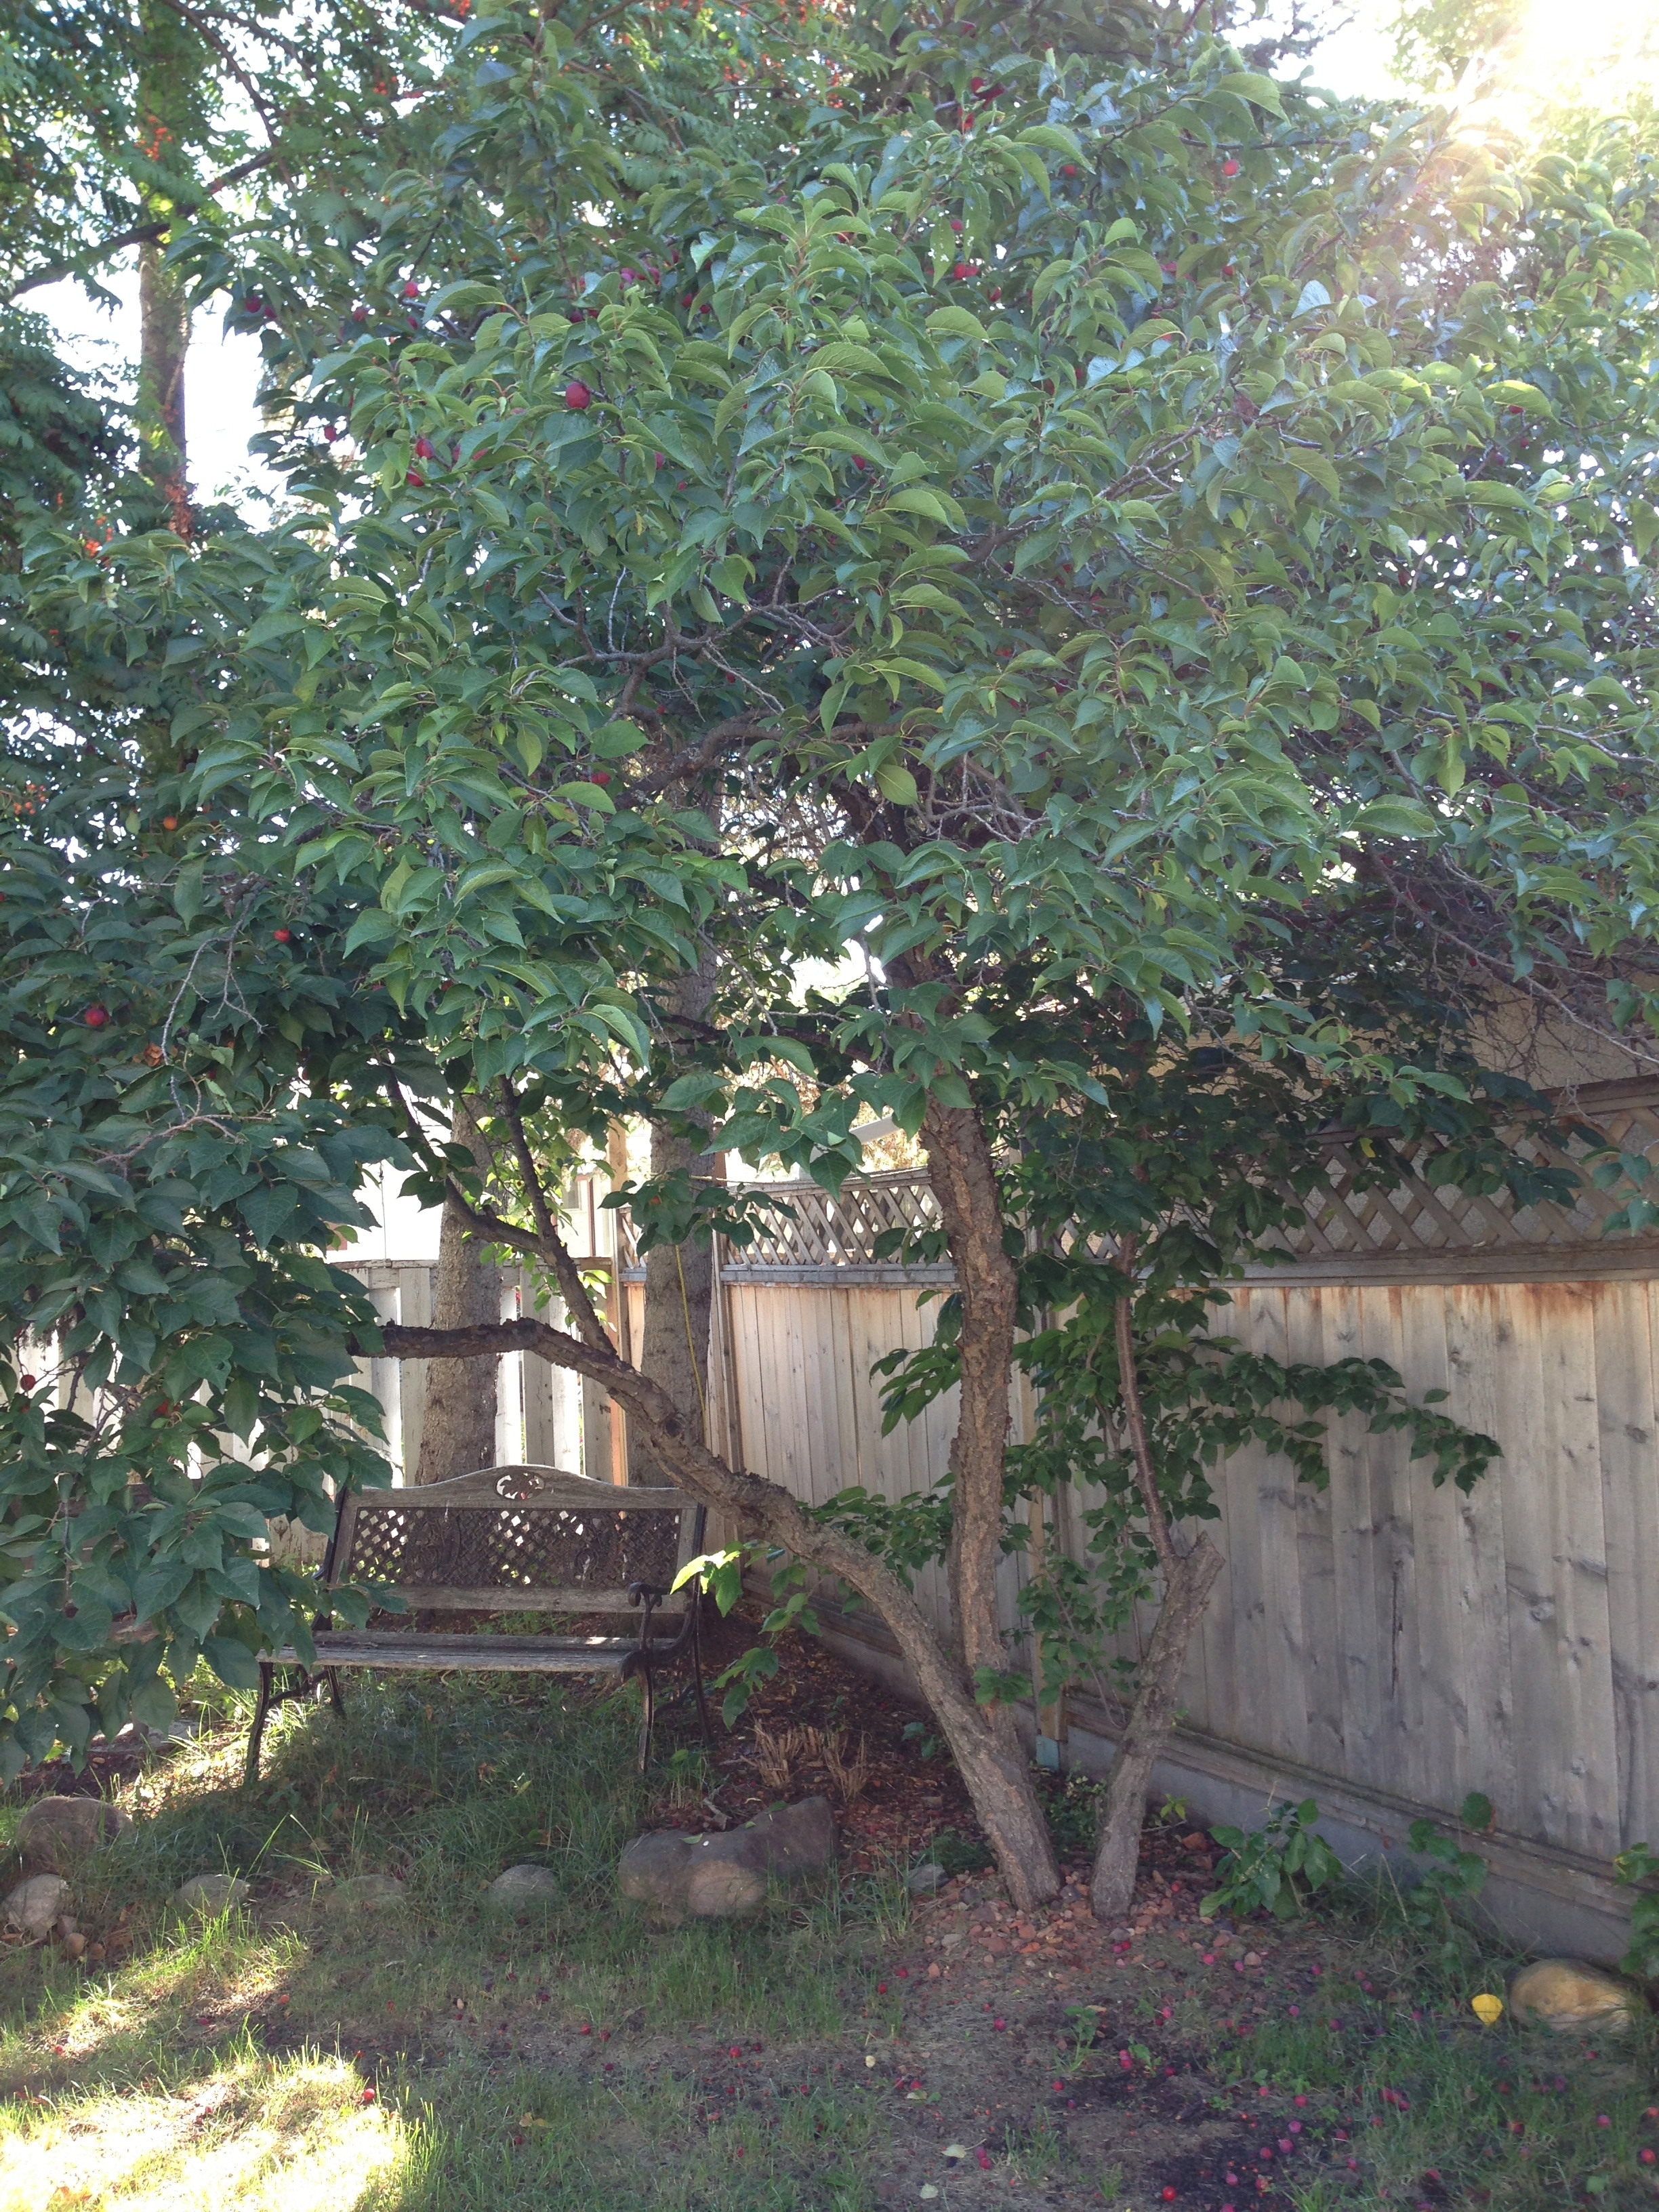 Senior Plum Tree